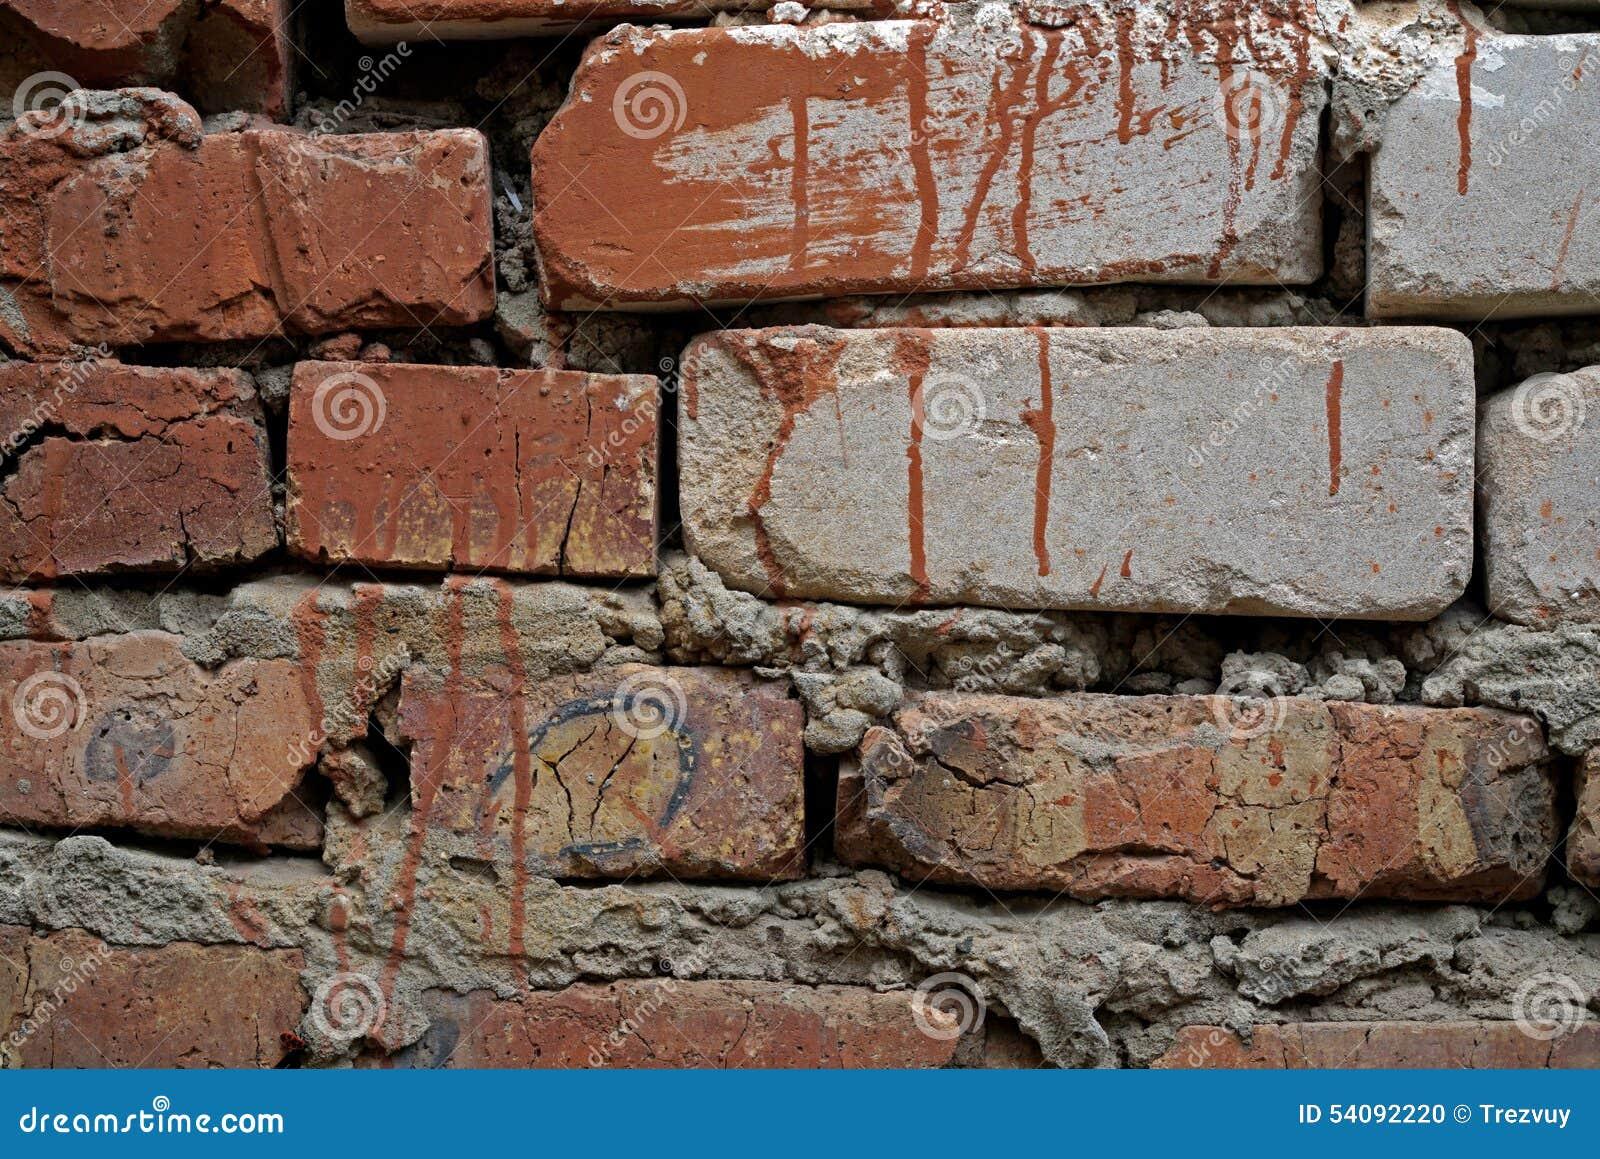 Oude witte bakstenen muurachtergrond